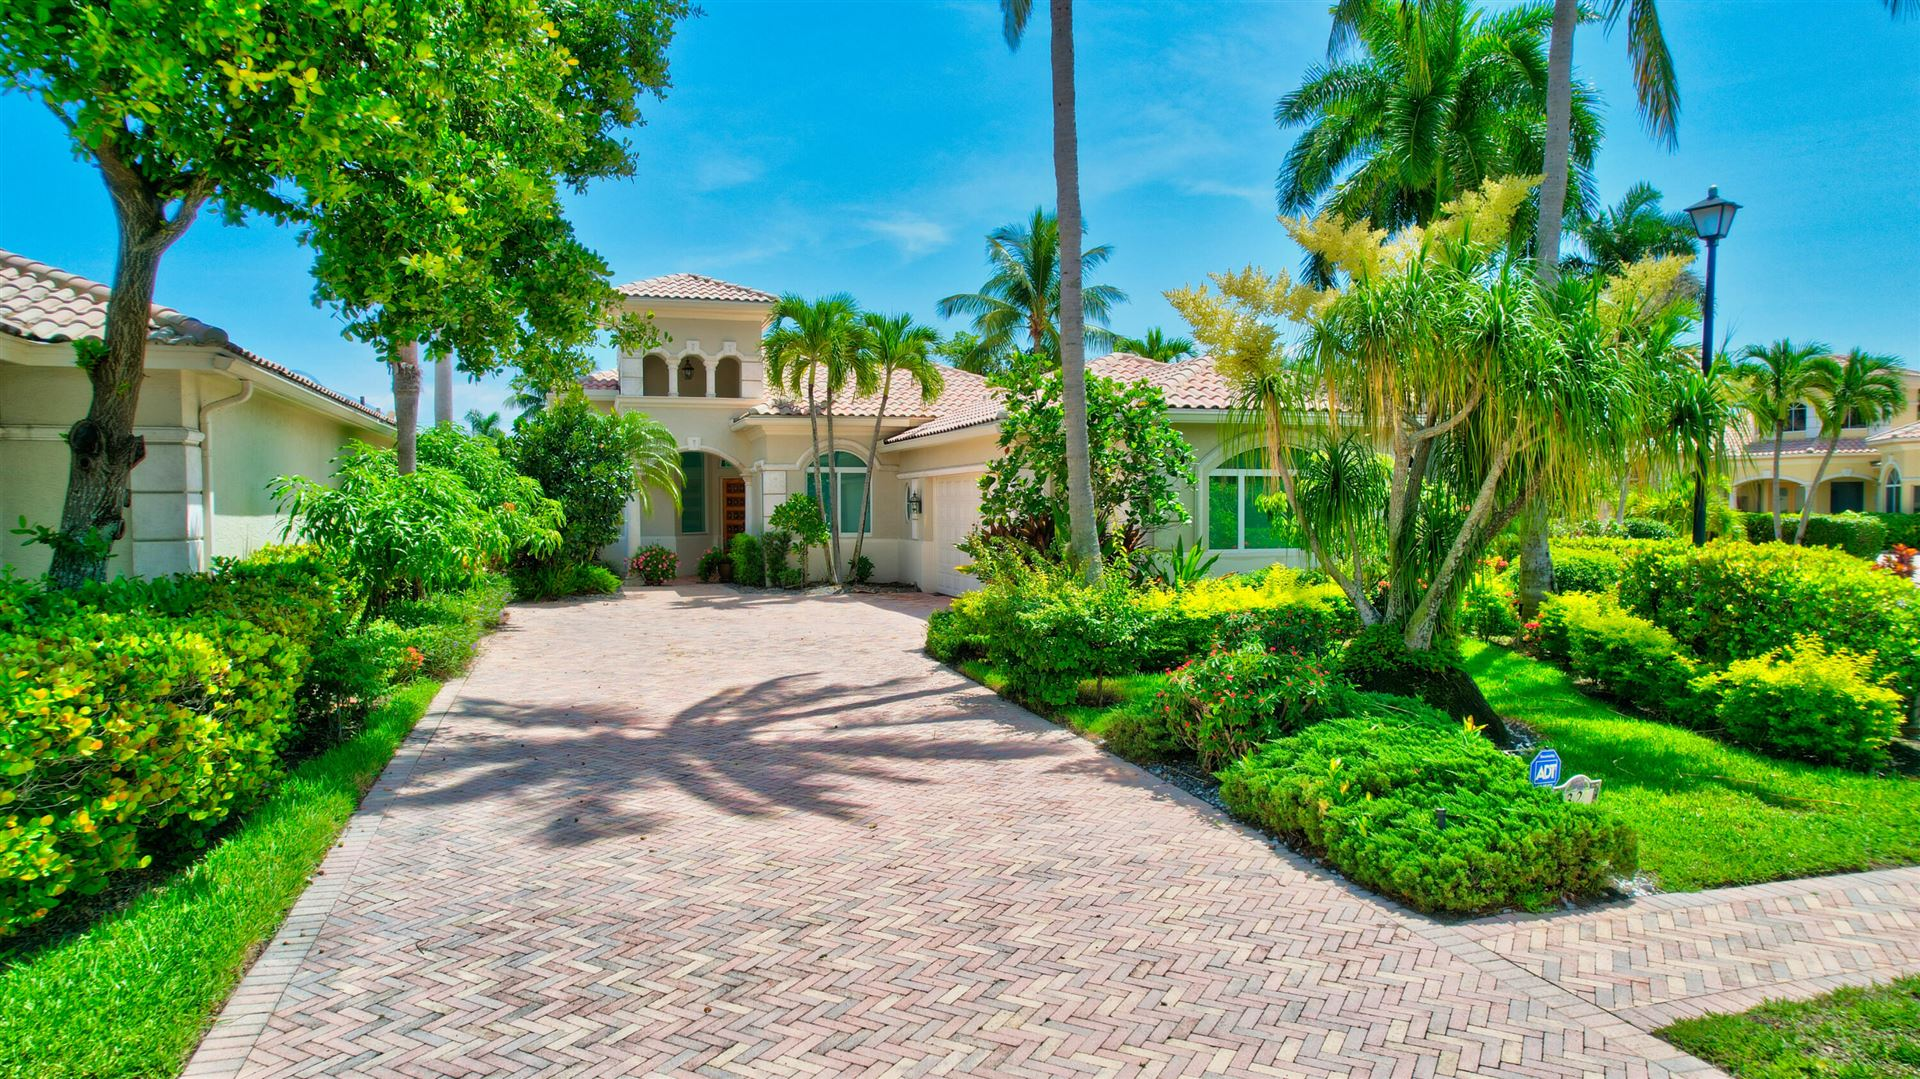 32 Island Drive, Boynton Beach, FL 33436 - MLS#: RX-10744380